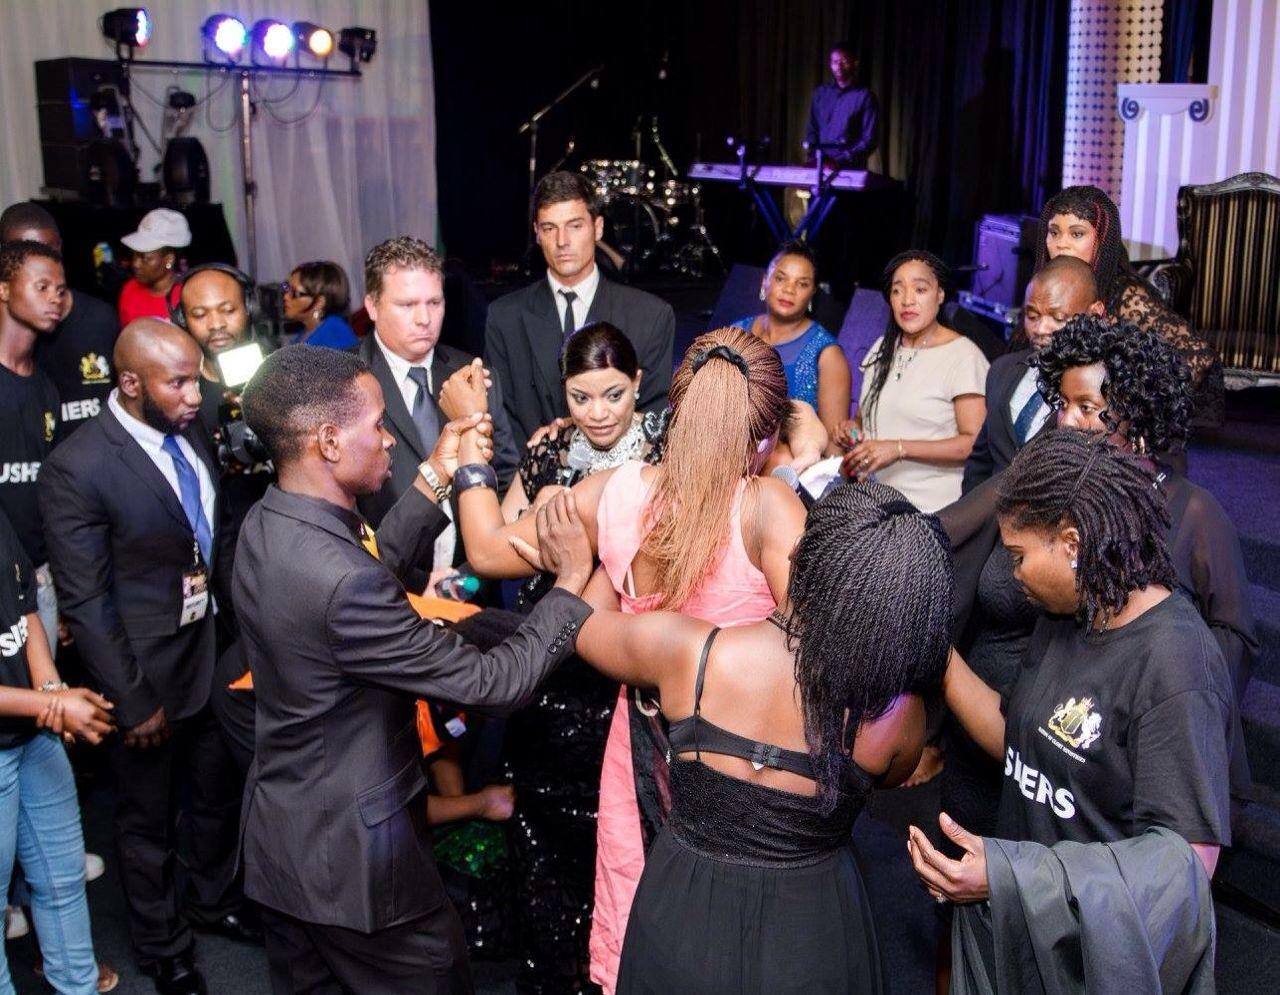 Morgan Tsvangirai exWife Locadia Launches Church